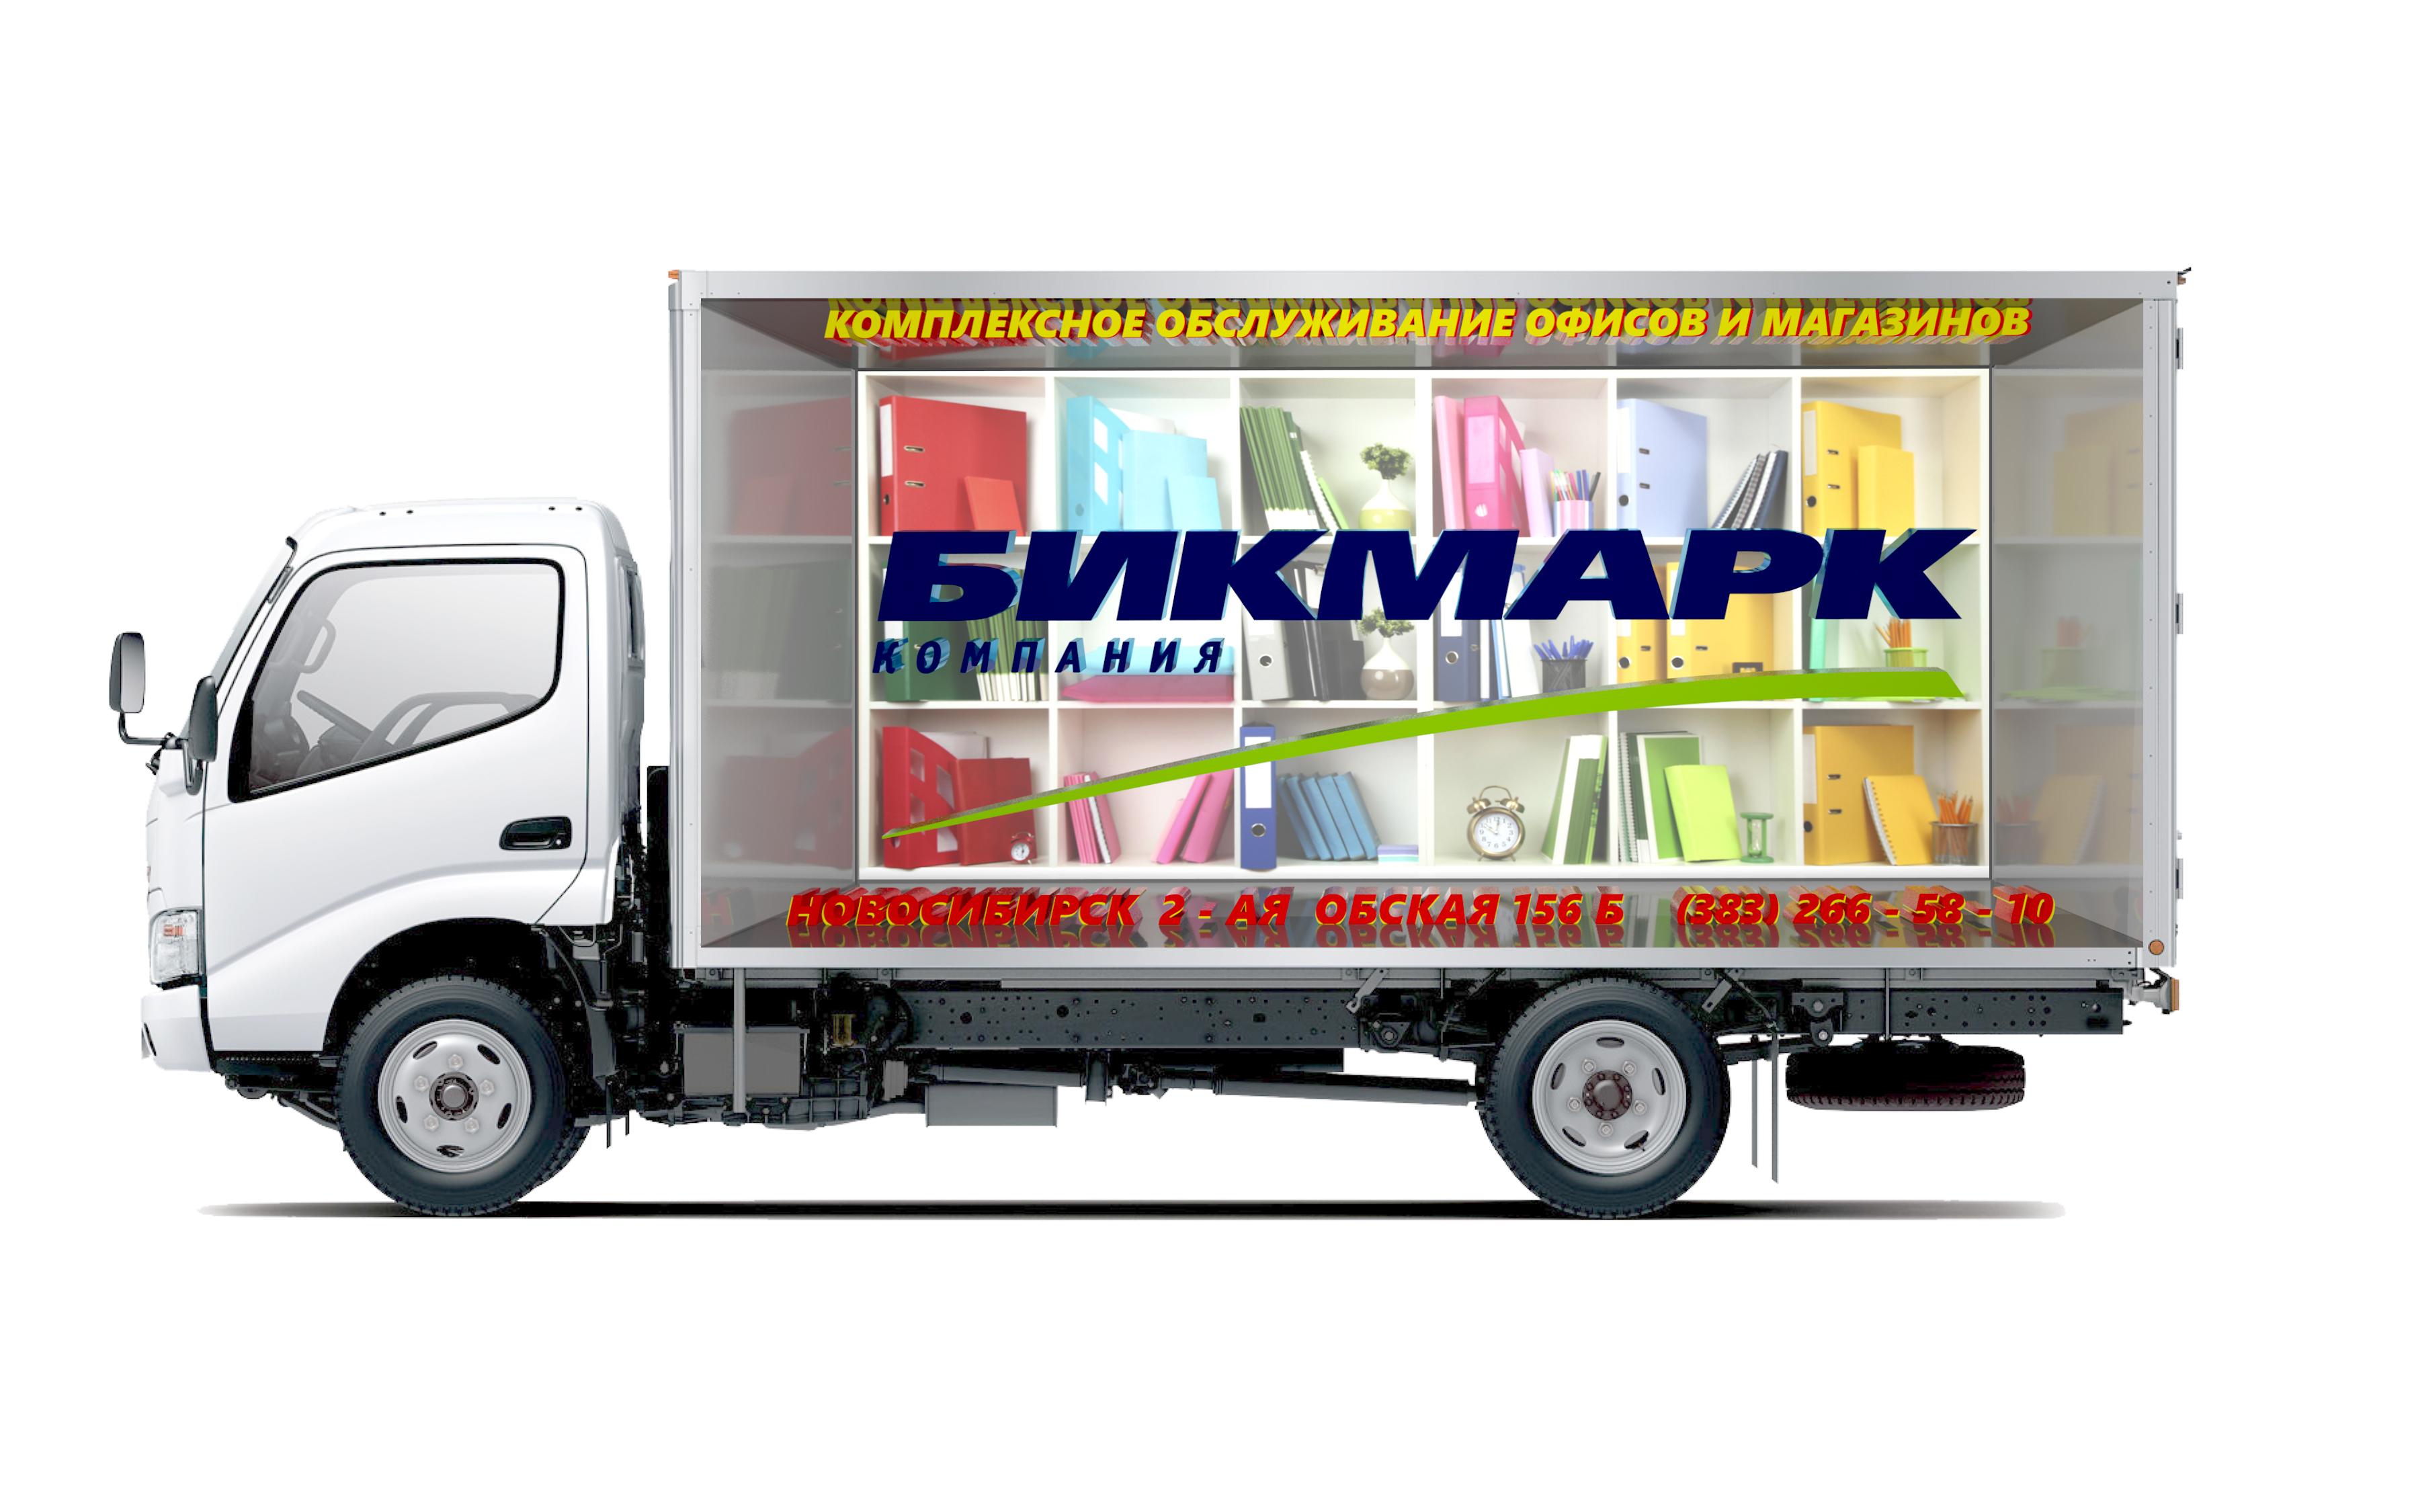 Разработка  рекламы на грузовые машины фото f_7565b2e600fb4282.jpg